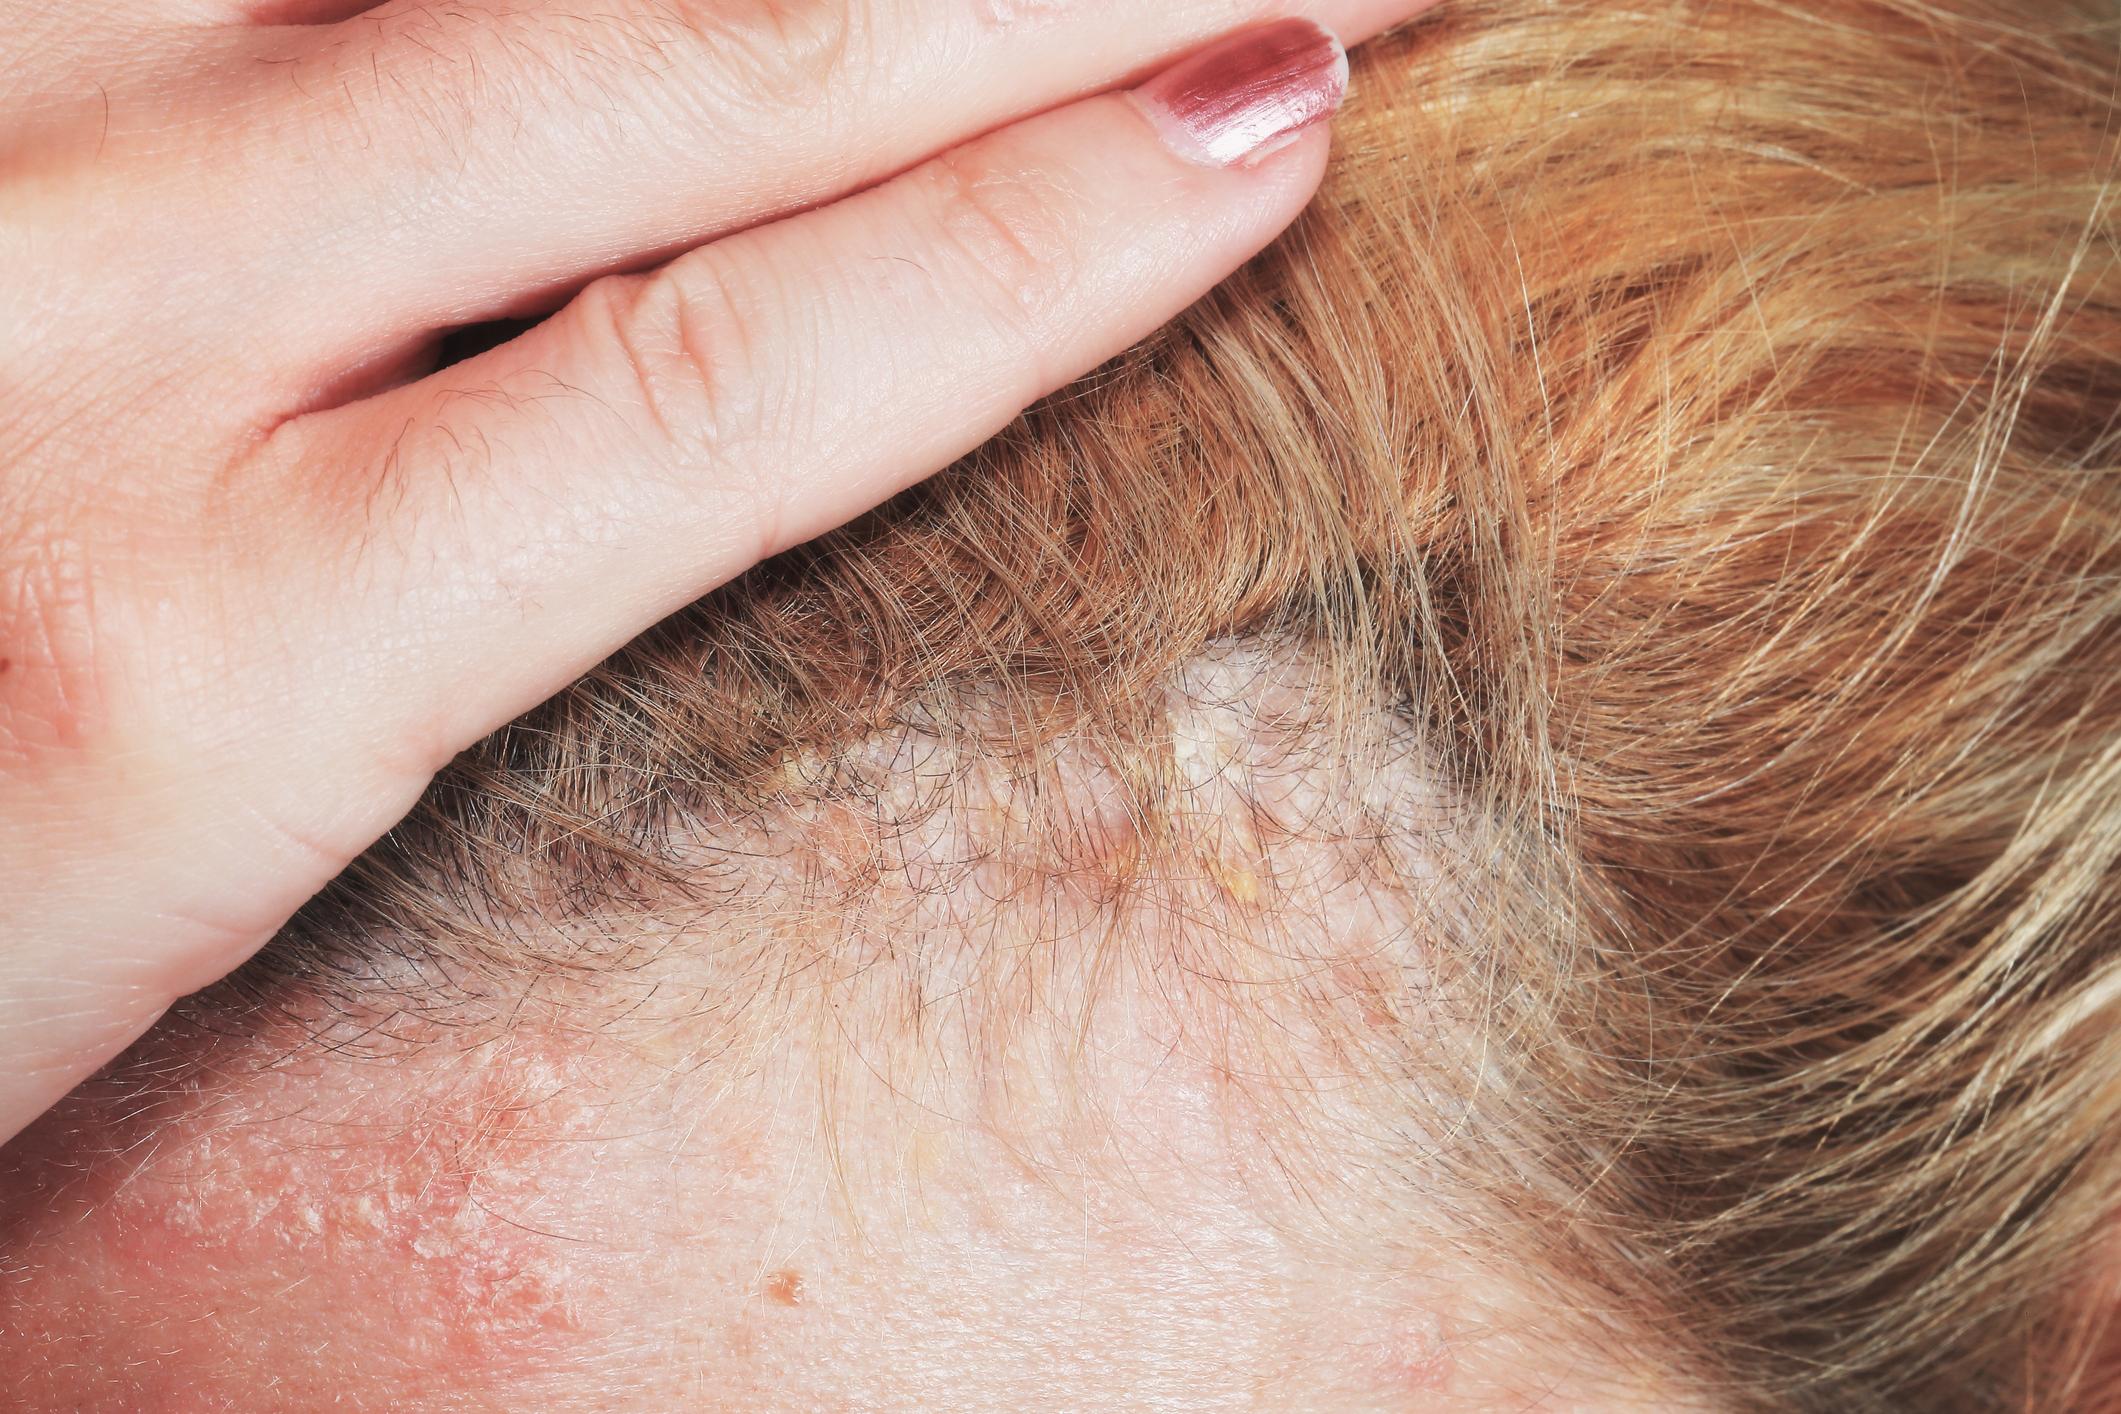 Is it Dandruff? Or Is it Scalp Psoriasis?